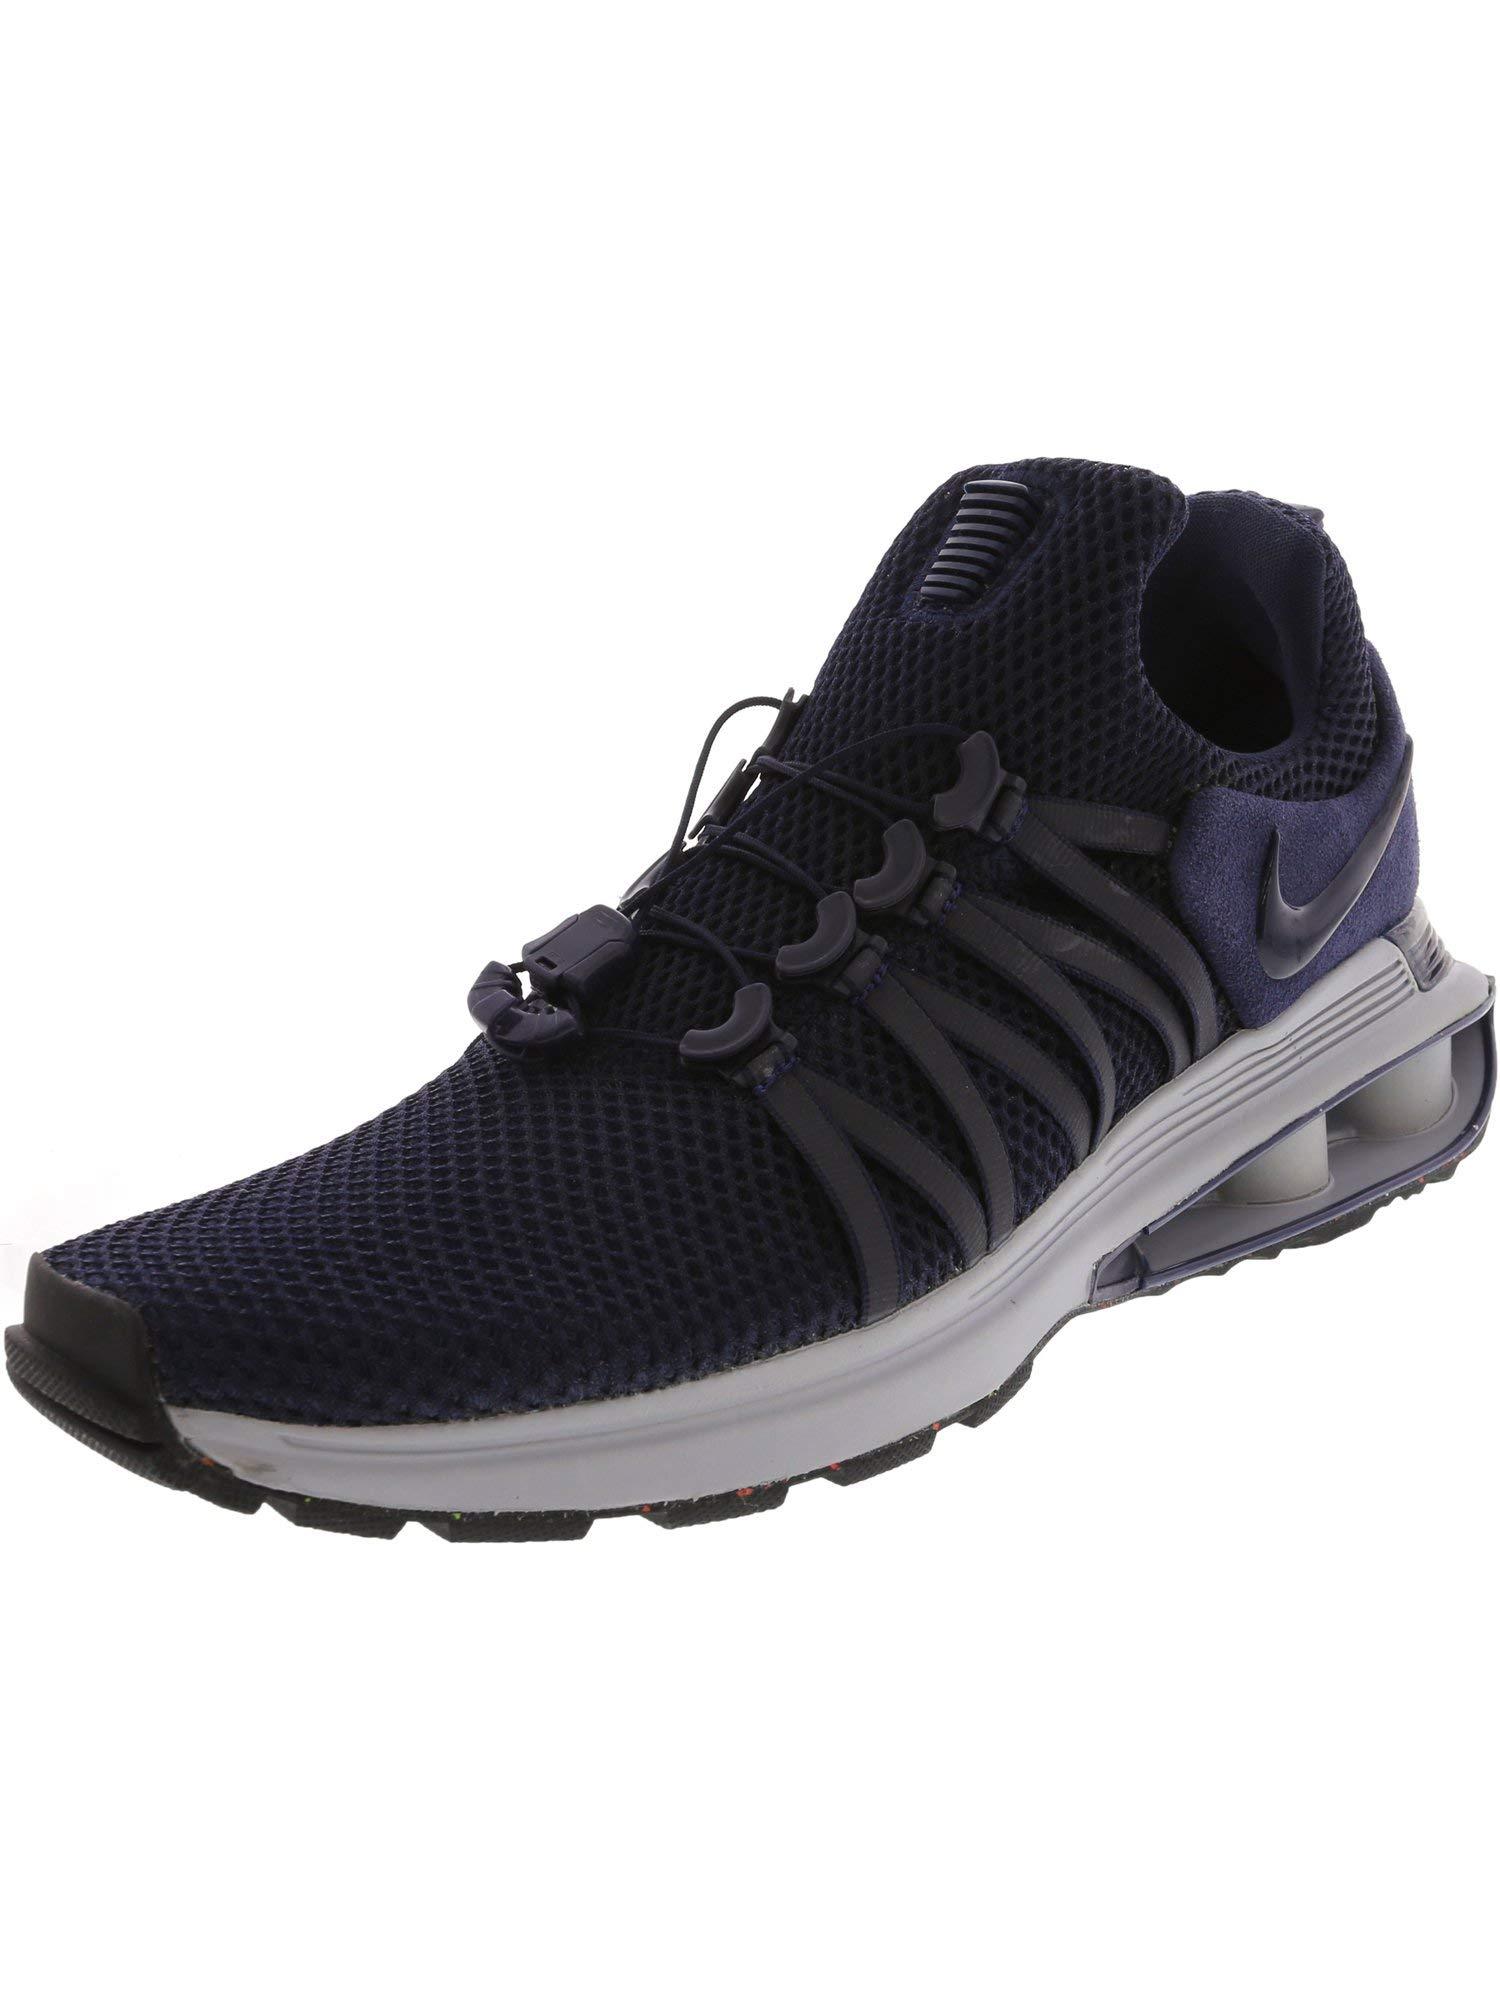 db77c7d1aab Galleon - Nike Men s Shox Gravity Ankle-High Running Shoe - 9.5M -  Obsidian Midnight Navy